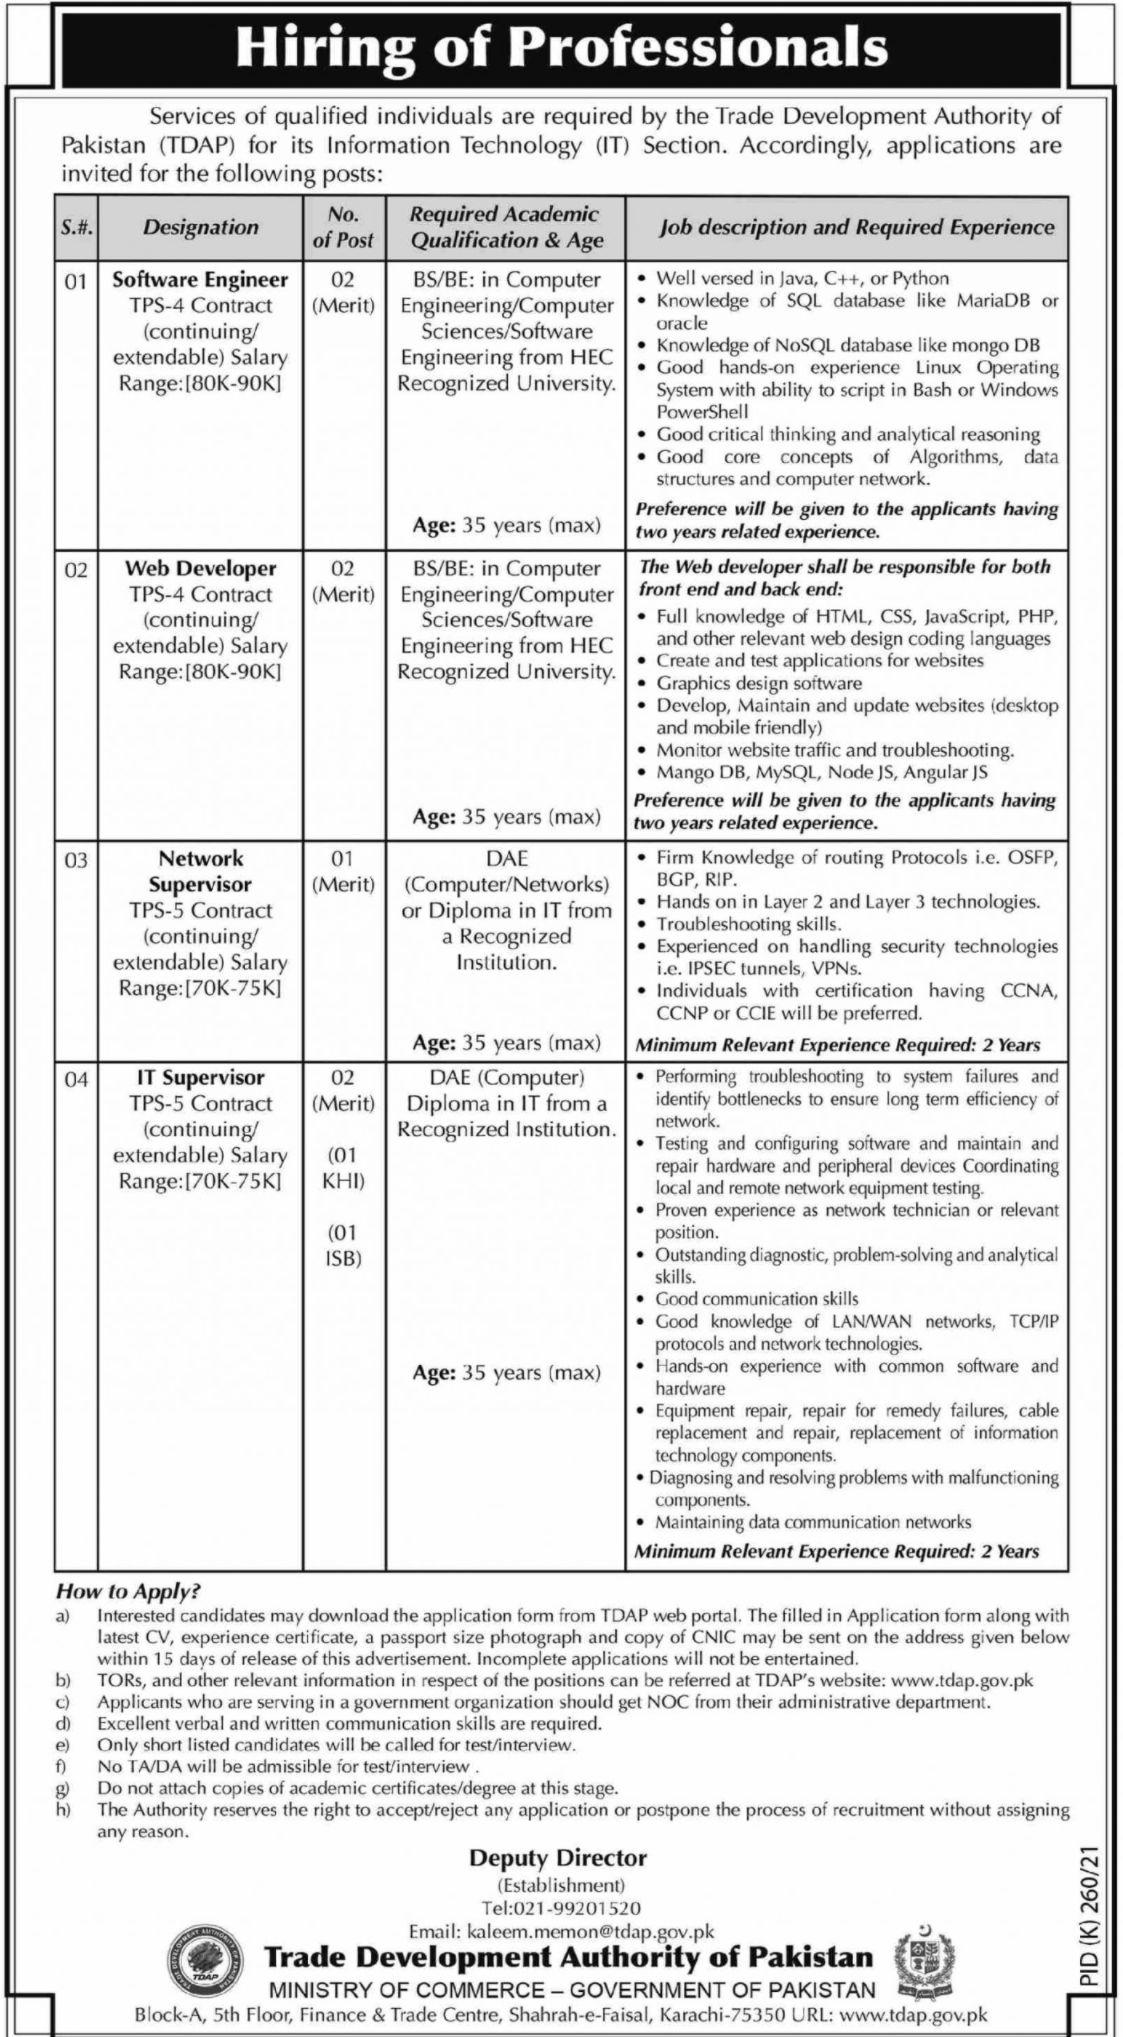 Trade Development Authority of Pakistan Vacancies 2021 3